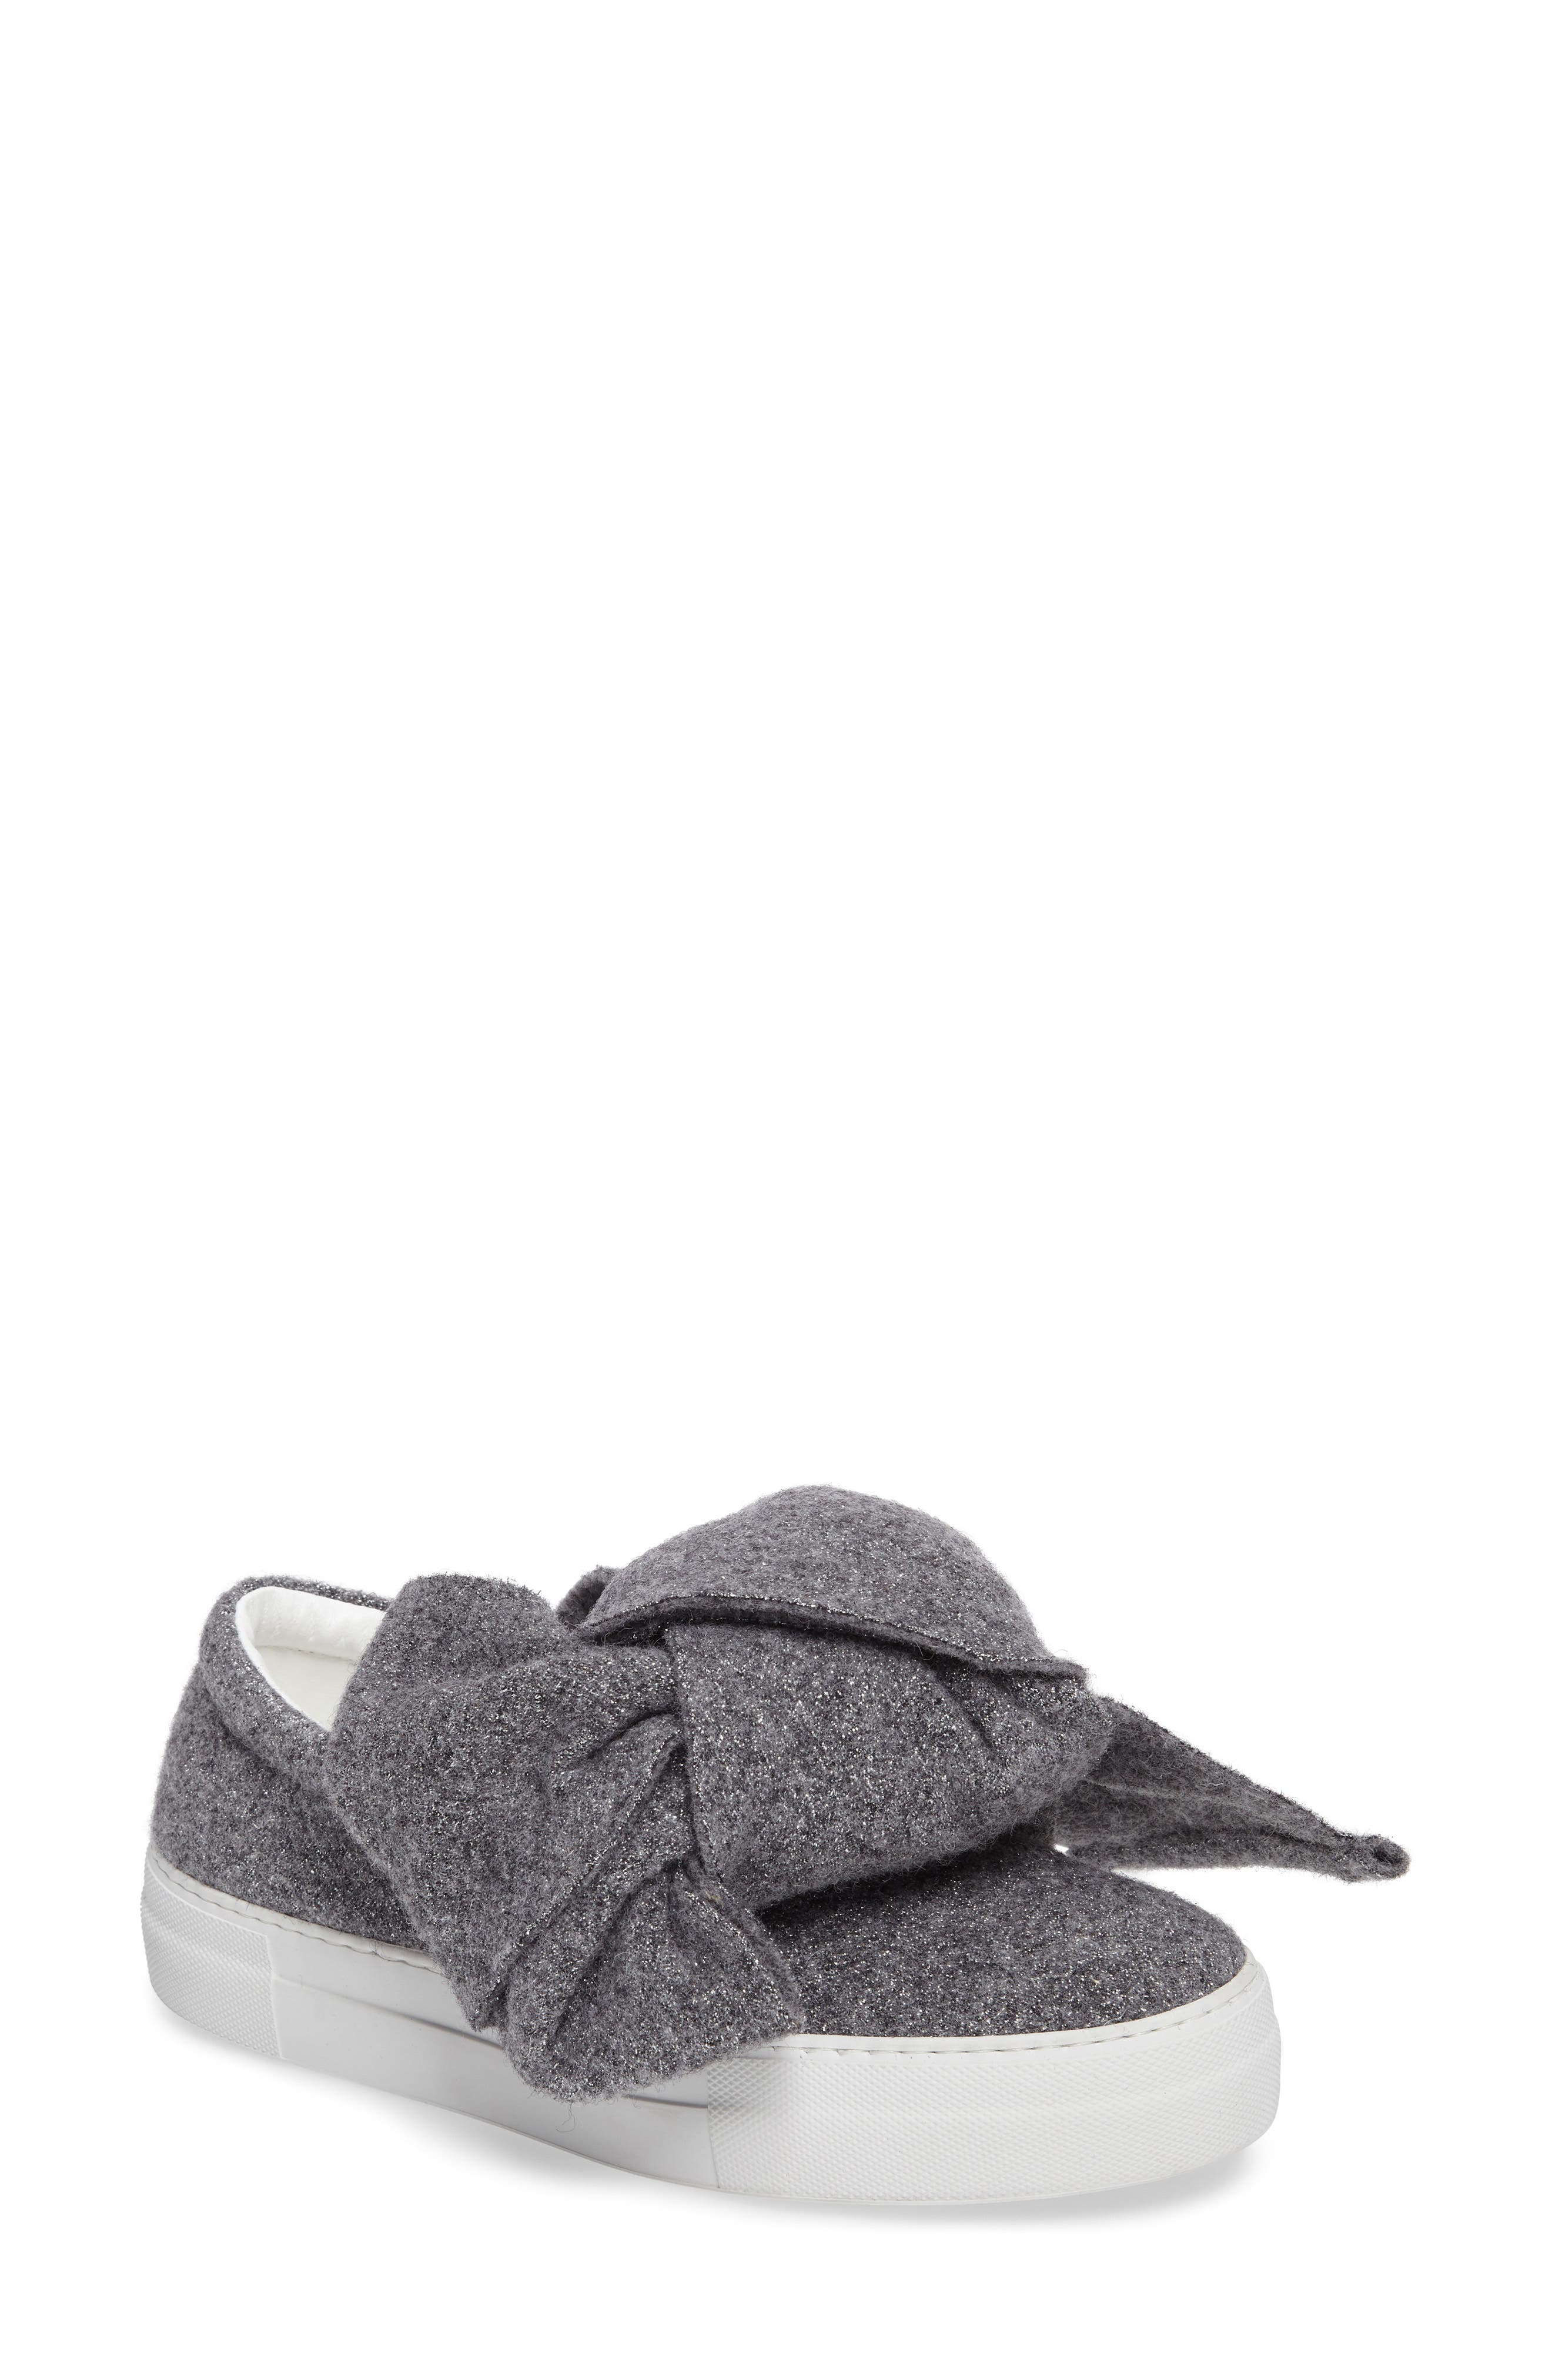 Bow Slip-On Sneaker,                             Main thumbnail 1, color,                             Grey Lurex Felt